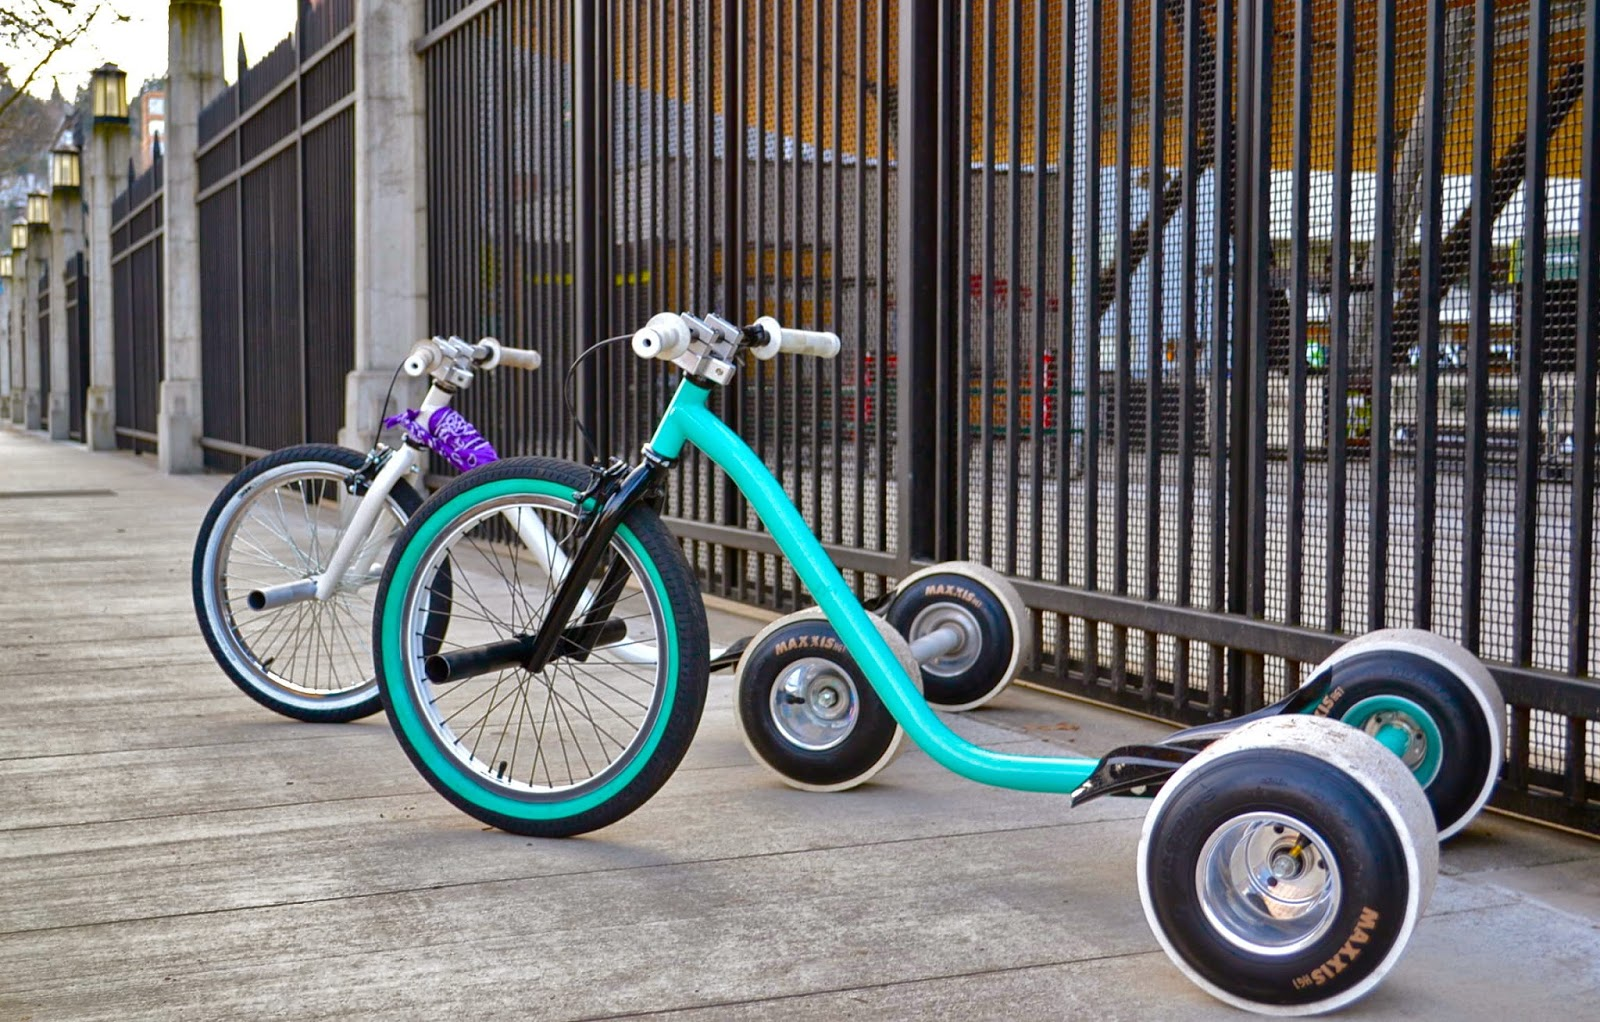 Дрифт велосипед своими руками